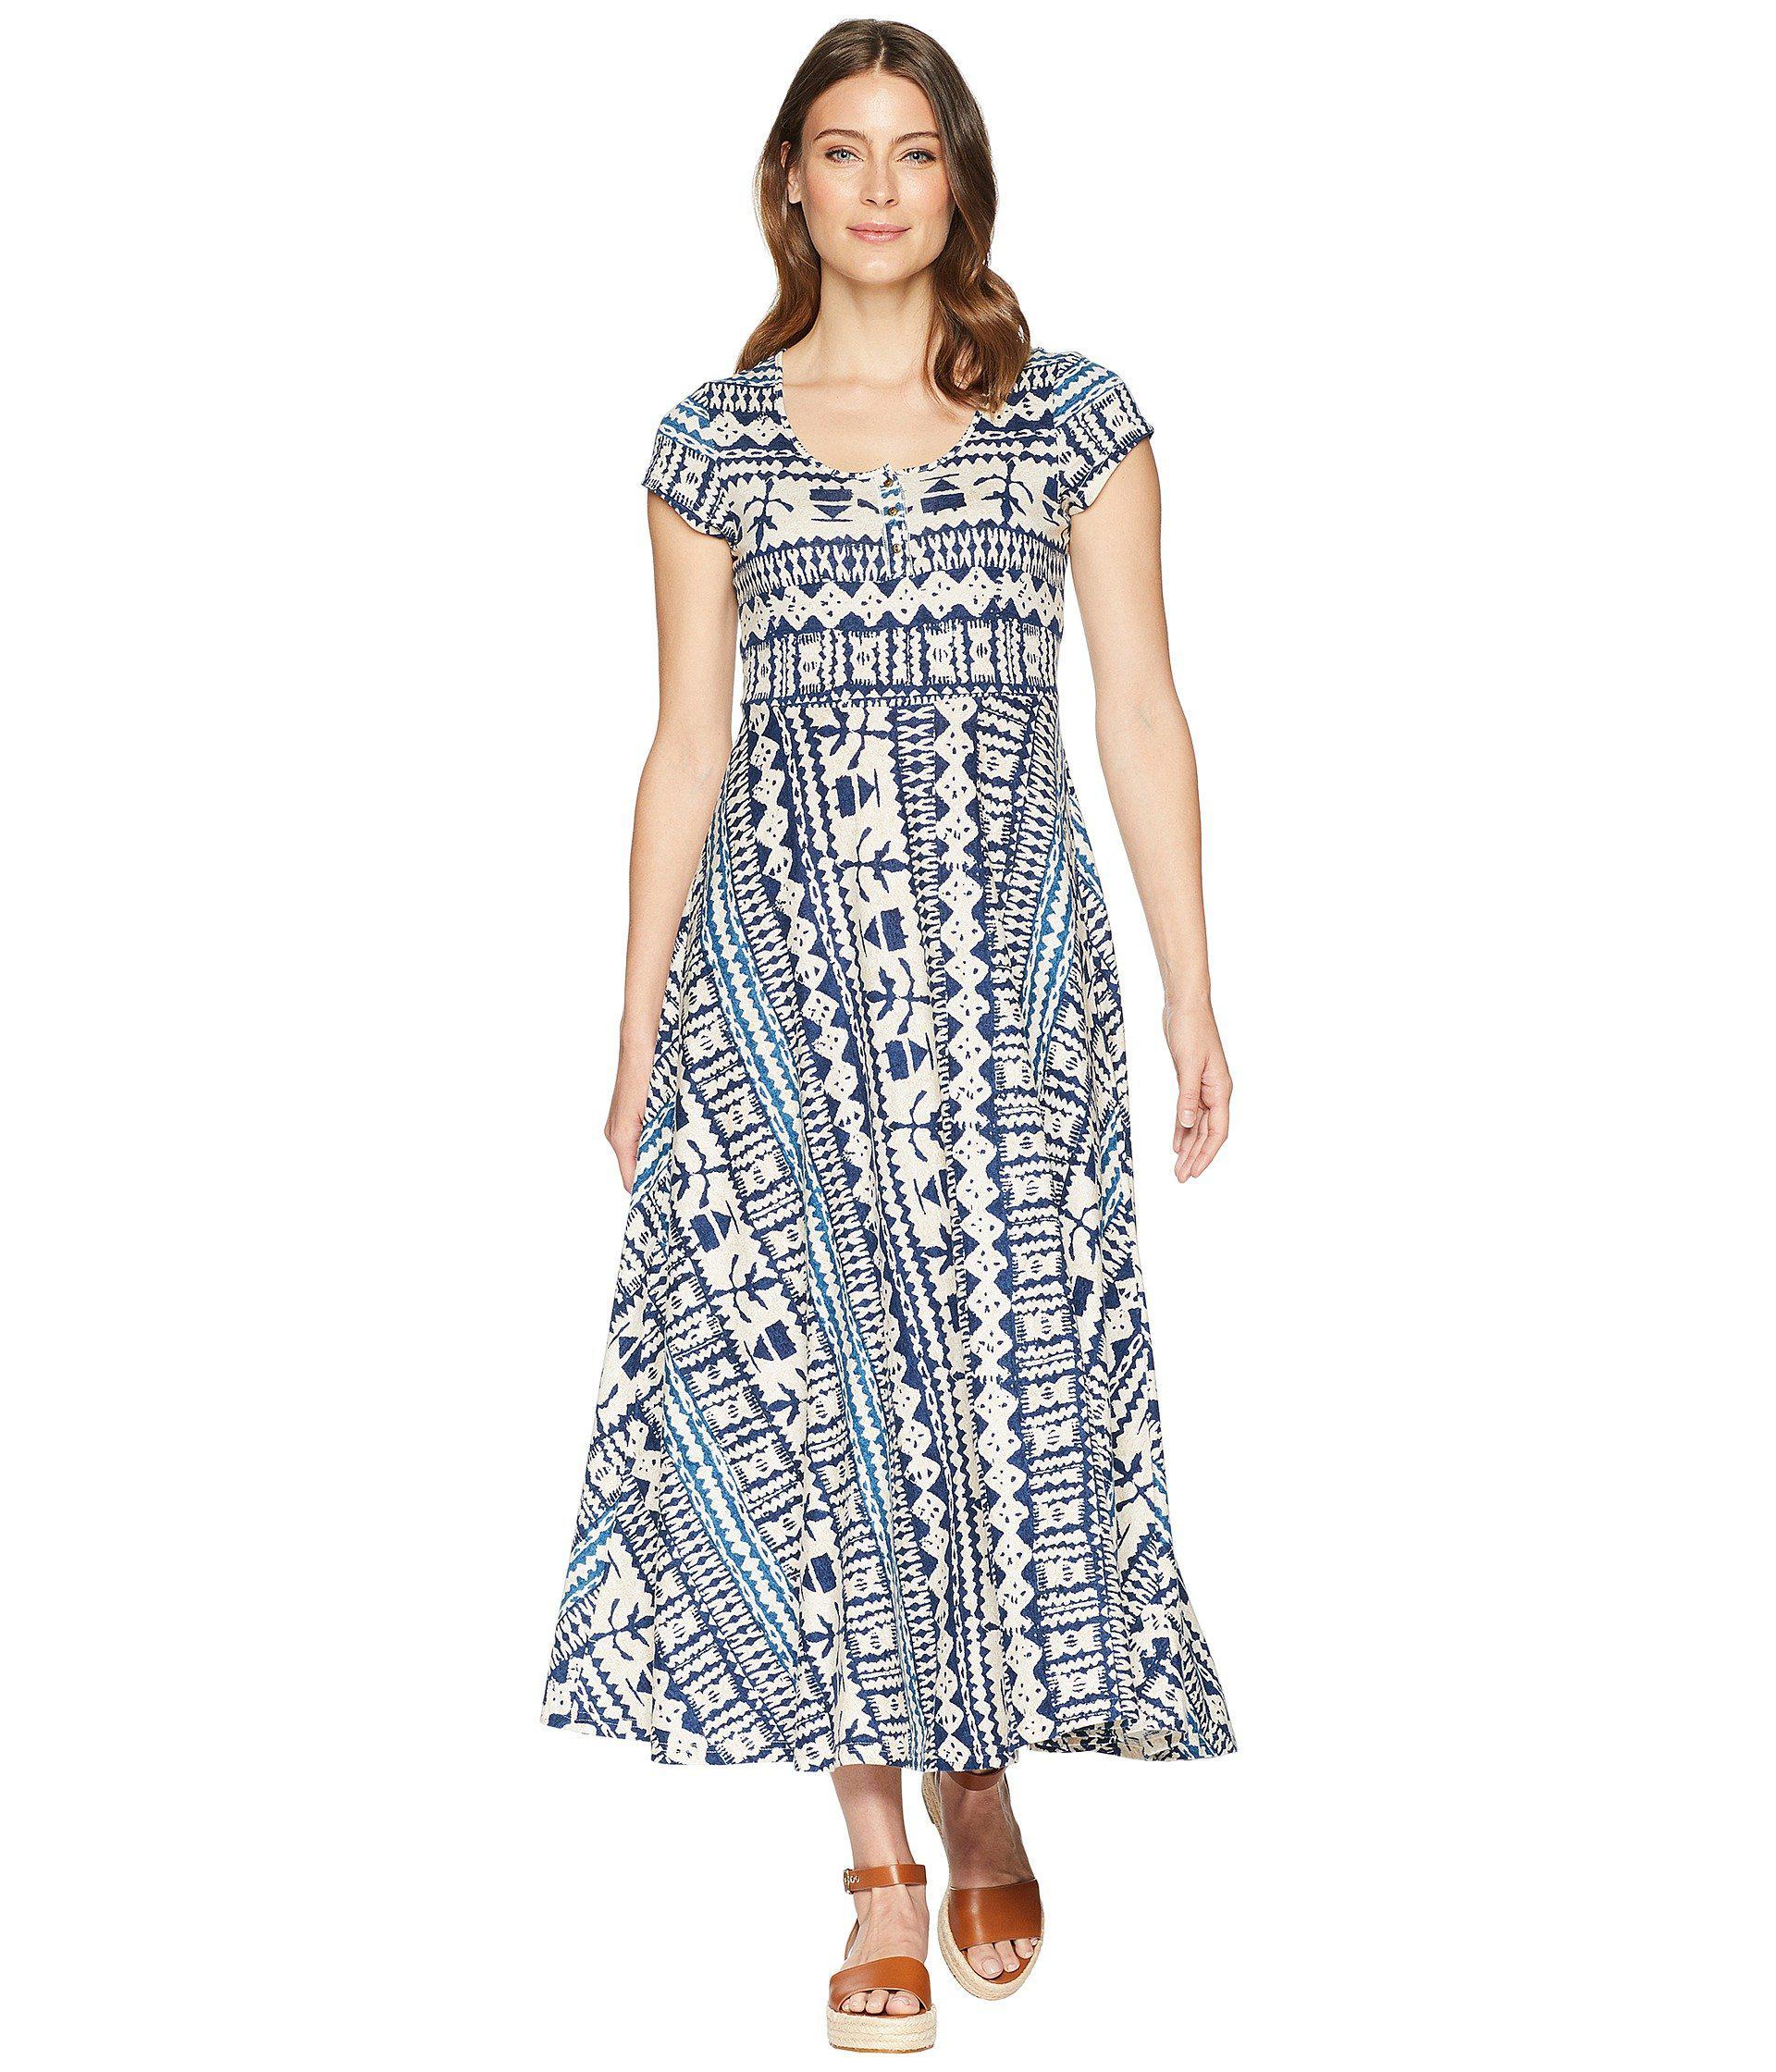 34dcb947068 Lyst - Chaps Short Sleeve Batik Cotton Jersey Maxi Dress in Blue ...